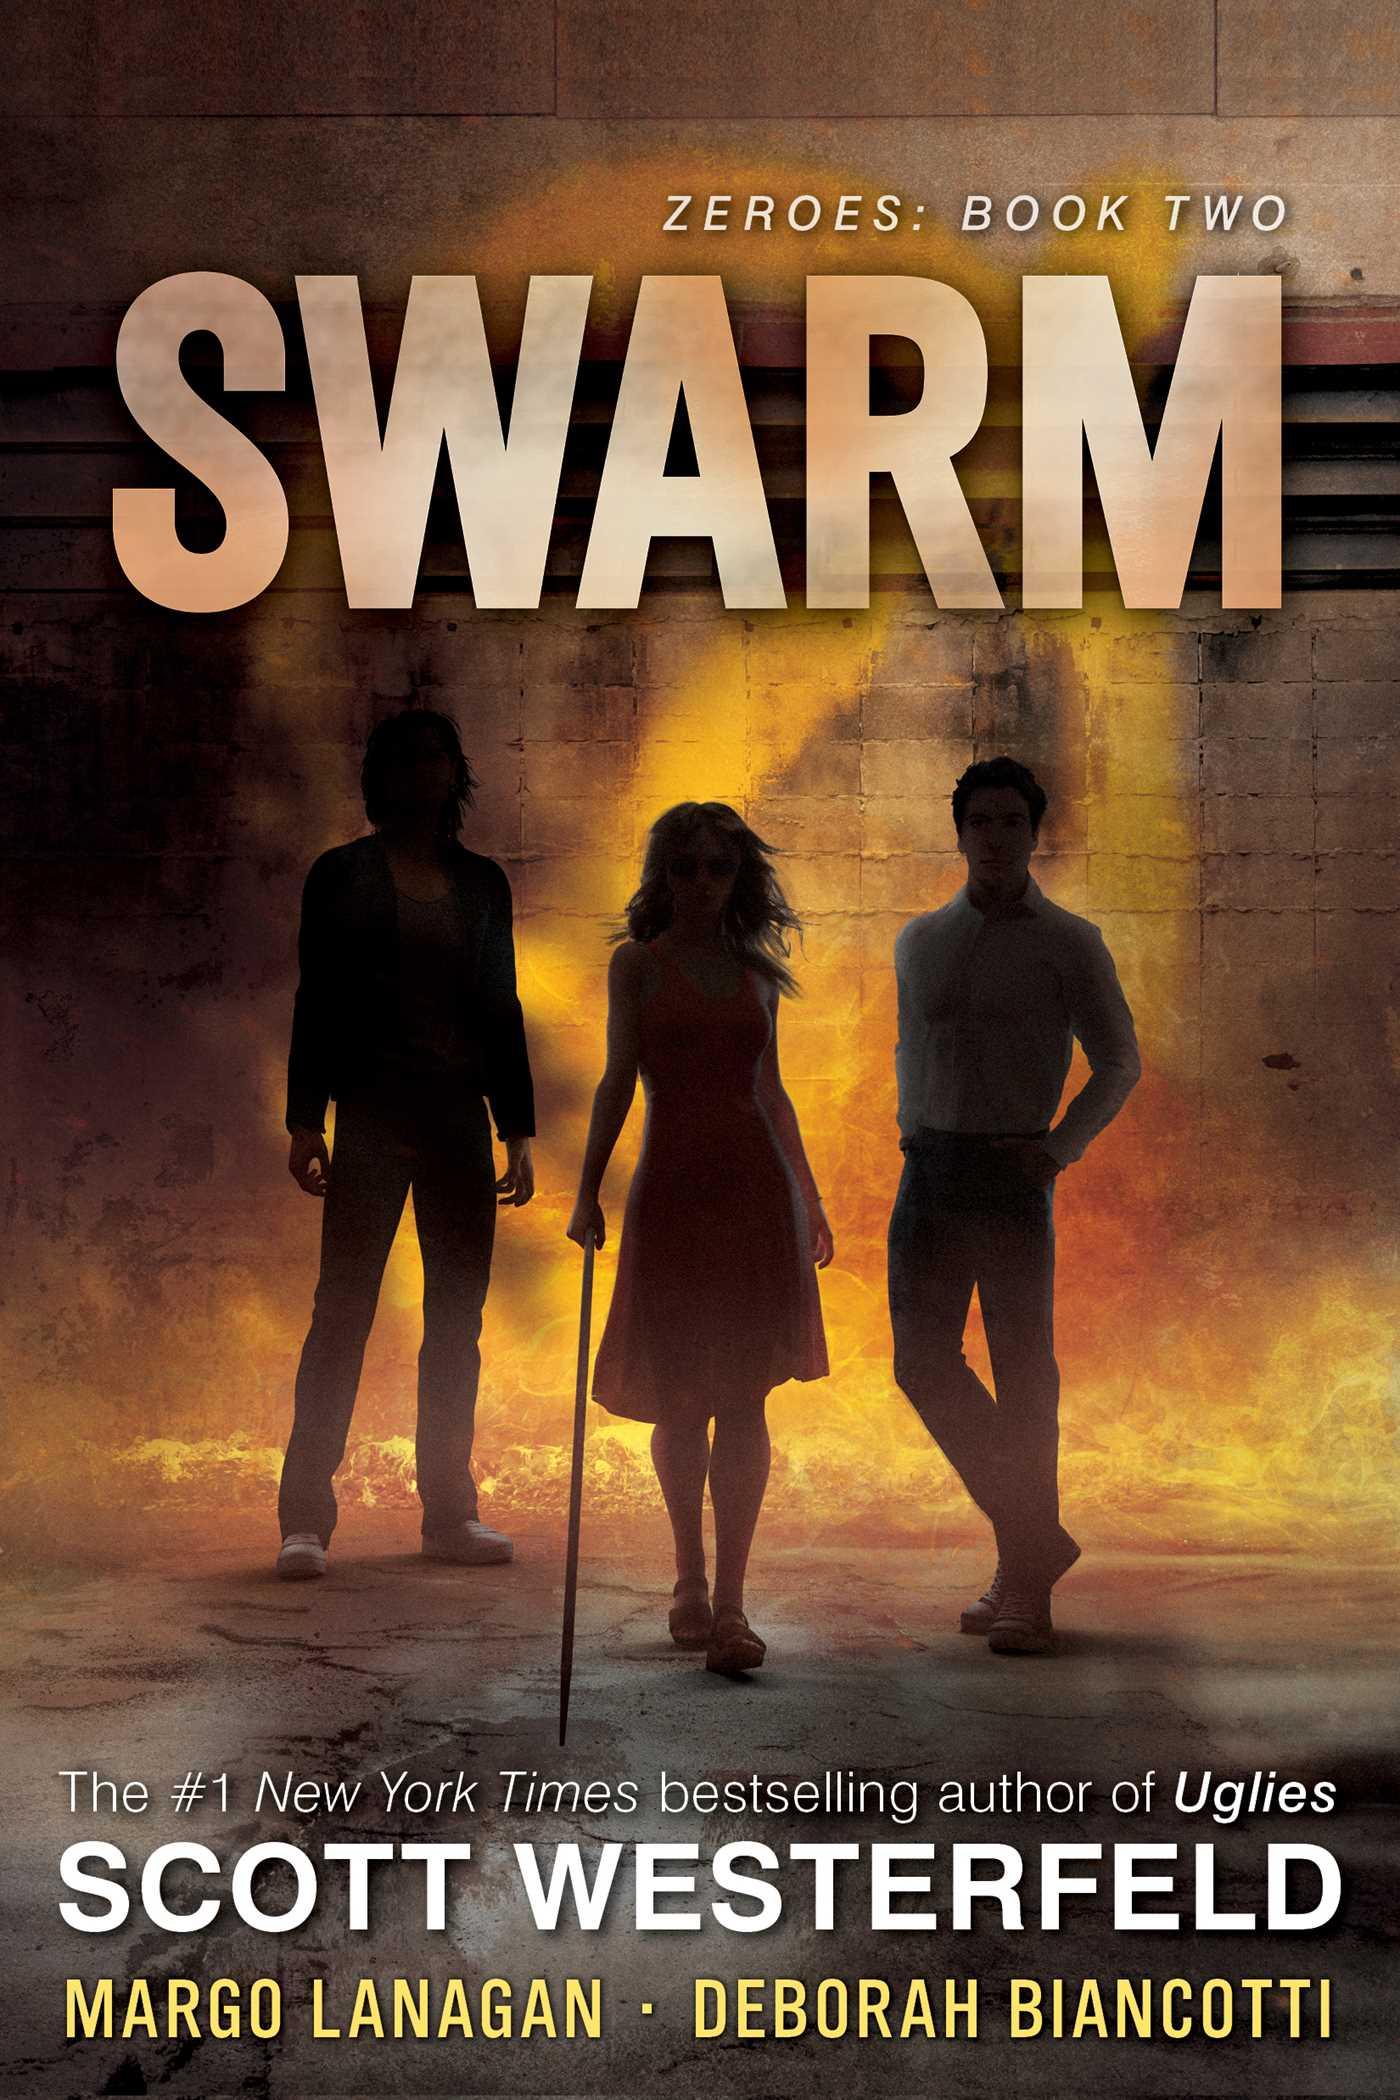 Swarm 9781481443401 hr